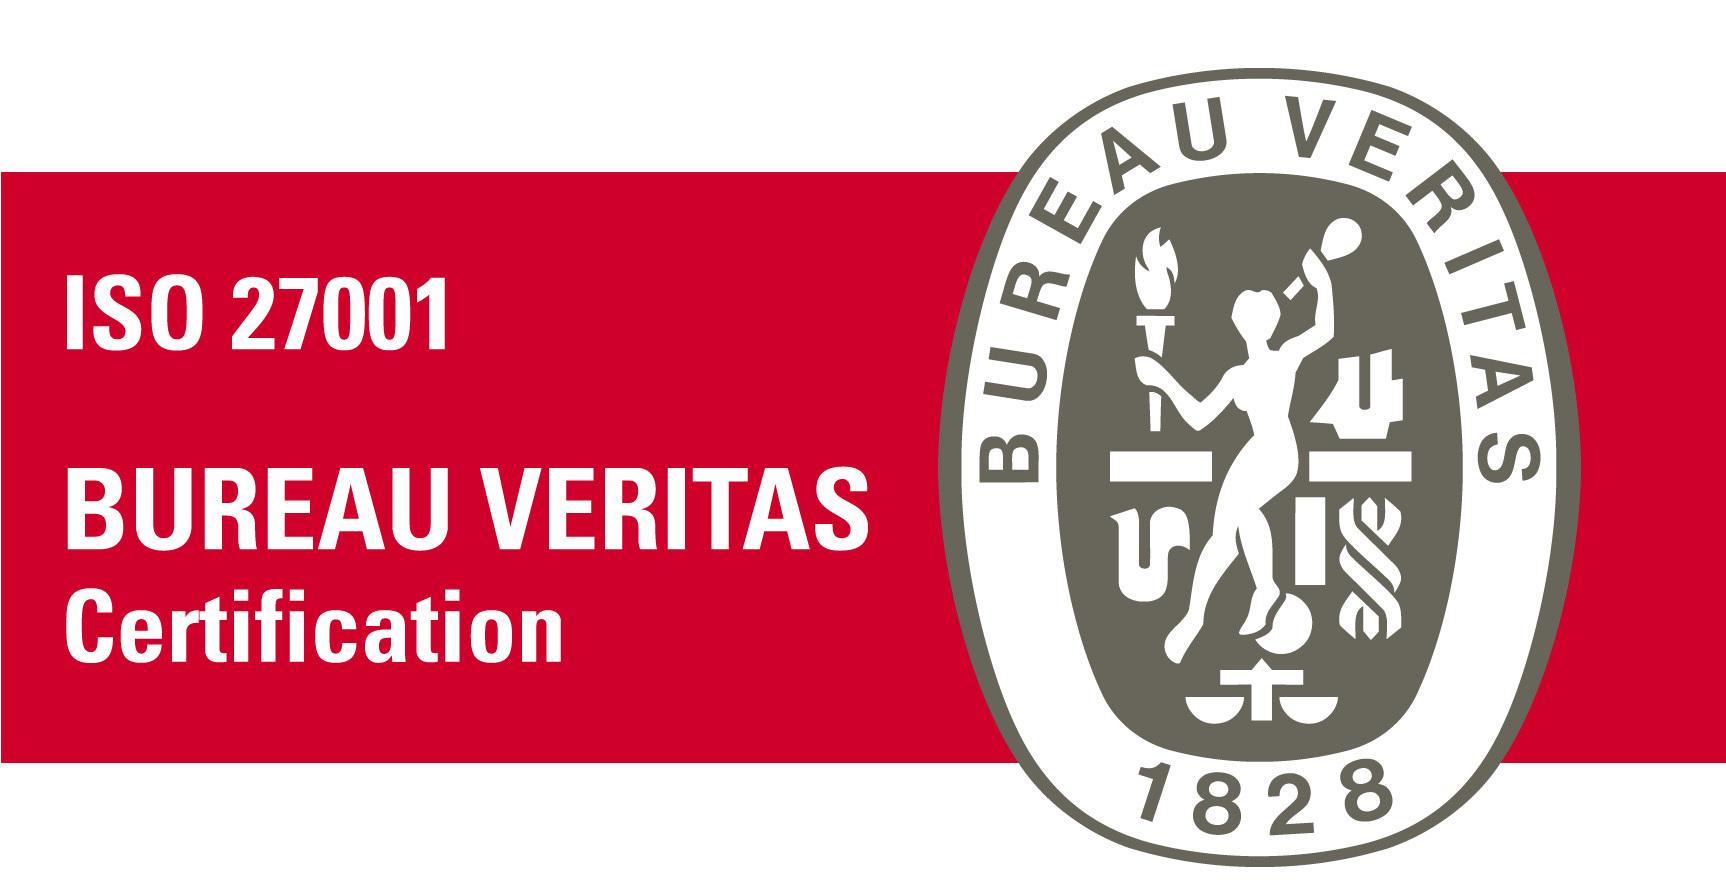 Bureu Veritas Certificate logo